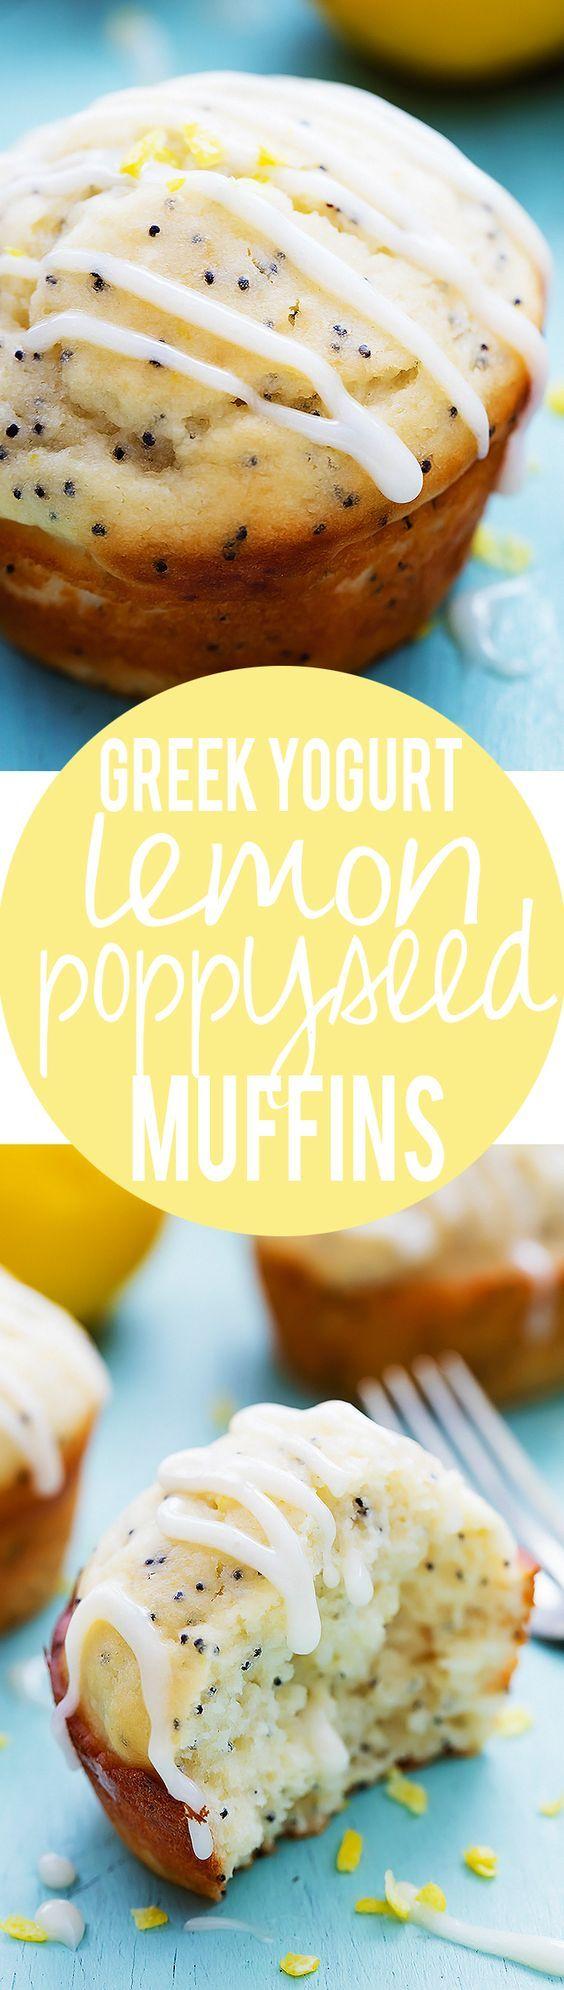 Greek Yogurt Lemon Poppyseed Muffins with Lemon Cream Cheese Glaze | Creme de la Crumb: